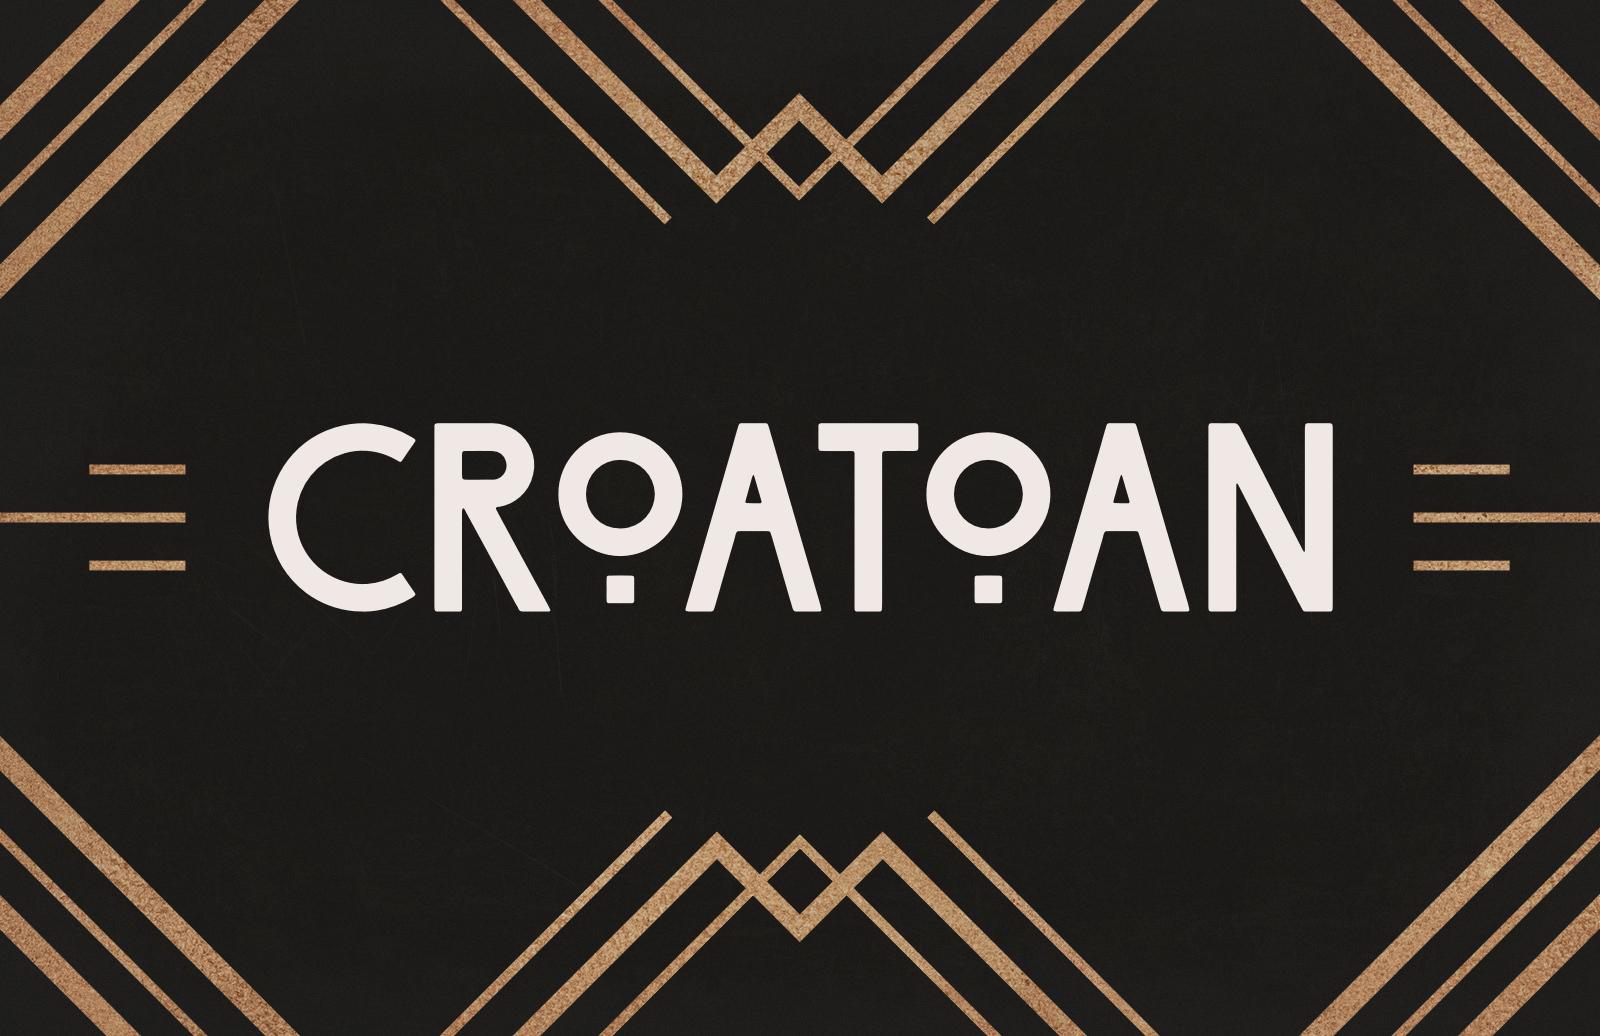 Croatoan - Art Deco Headline Font